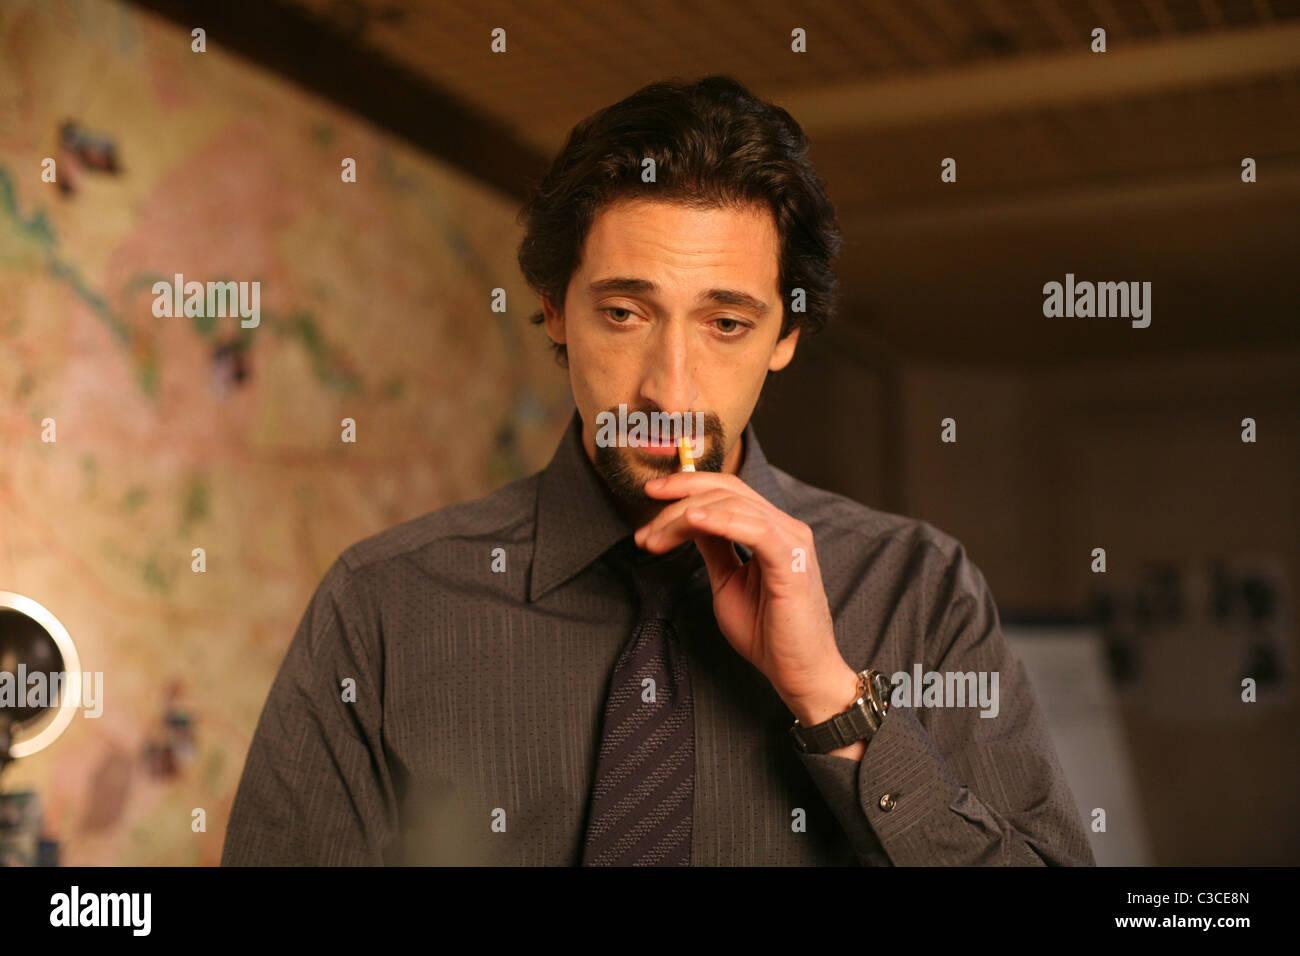 ADRIEN BRODY GIALLO (2009) - Stock Image